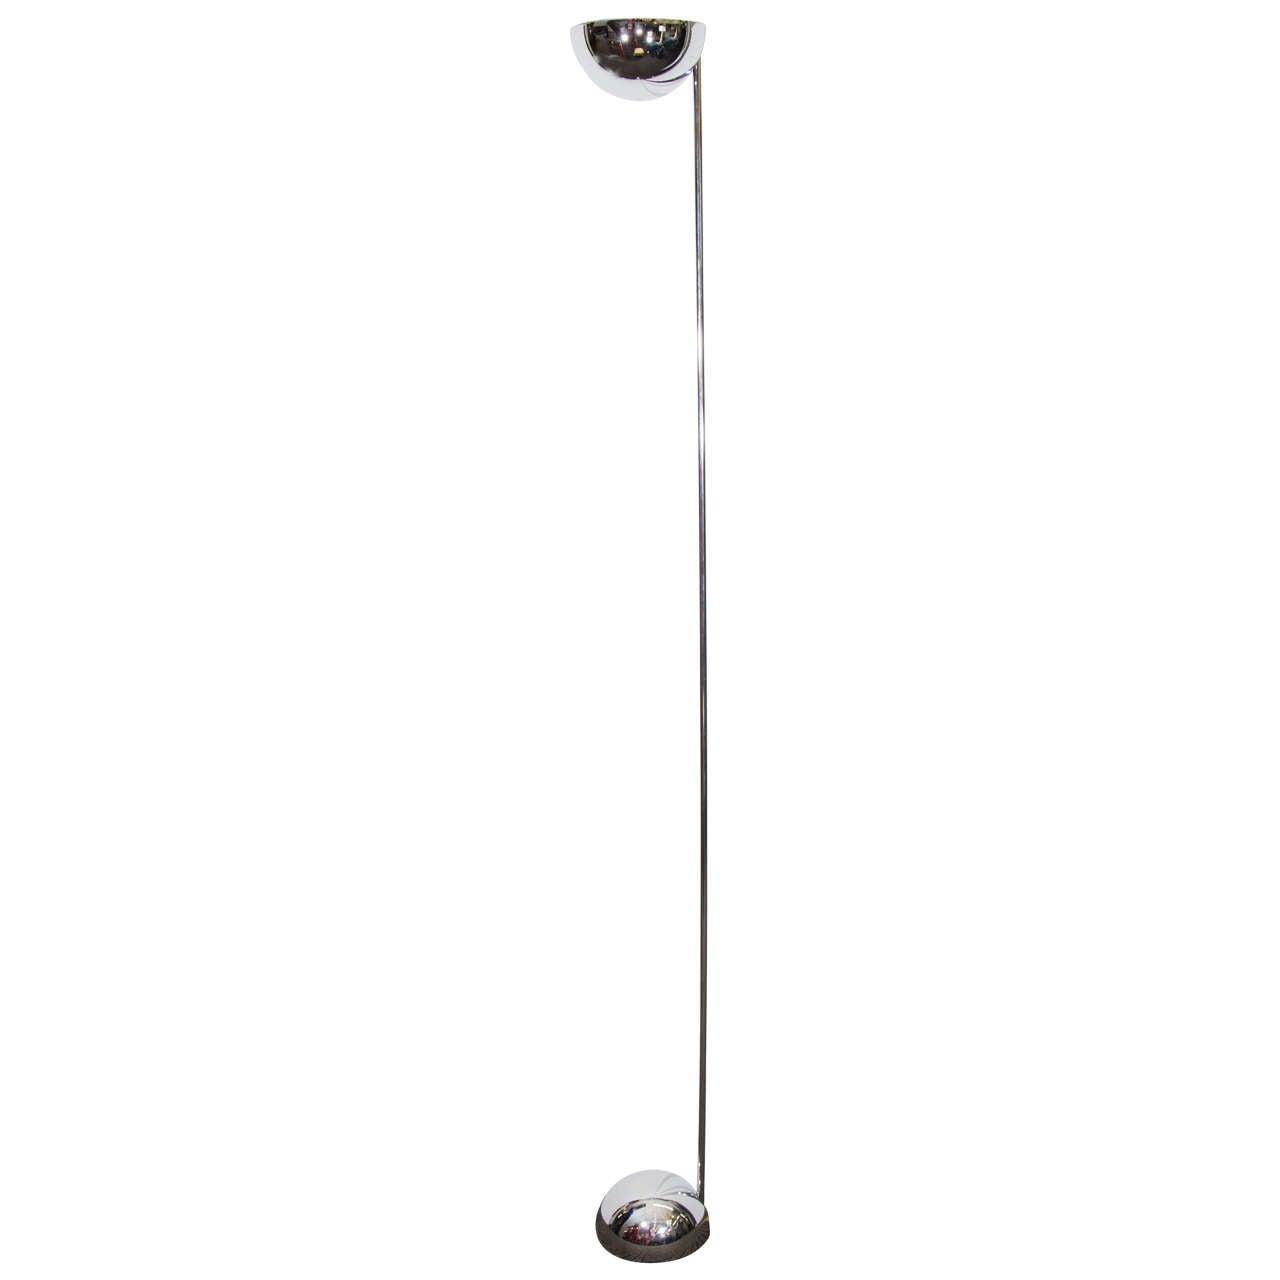 A Midcentury Chrome Half Globe Floor Lamp